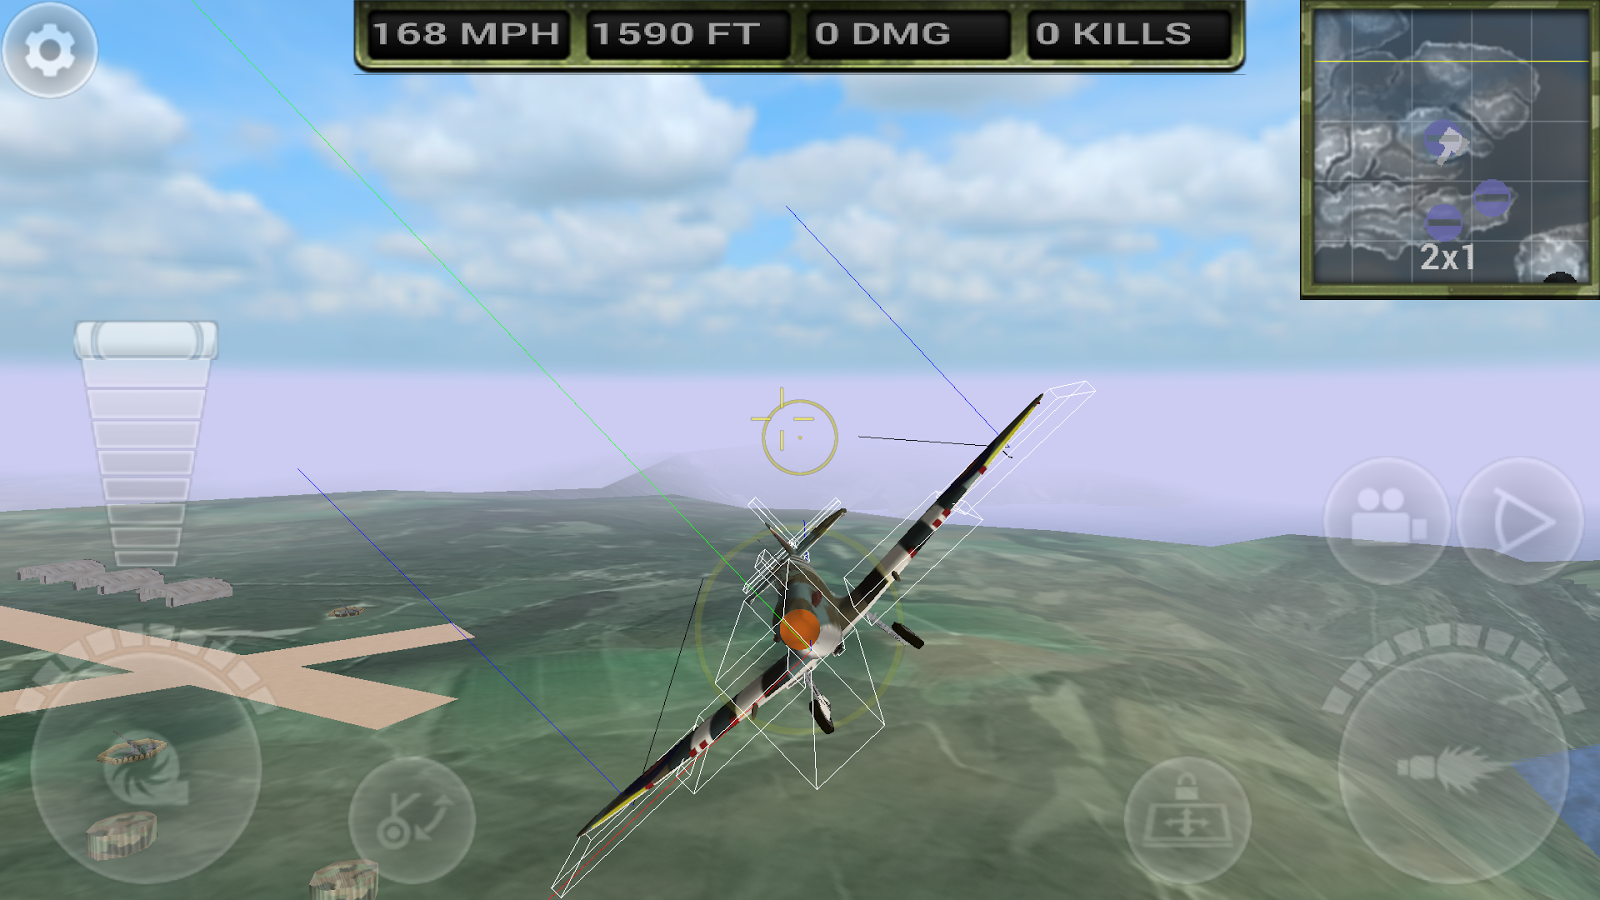 Flight Simulator - Game - Typing Games Zone